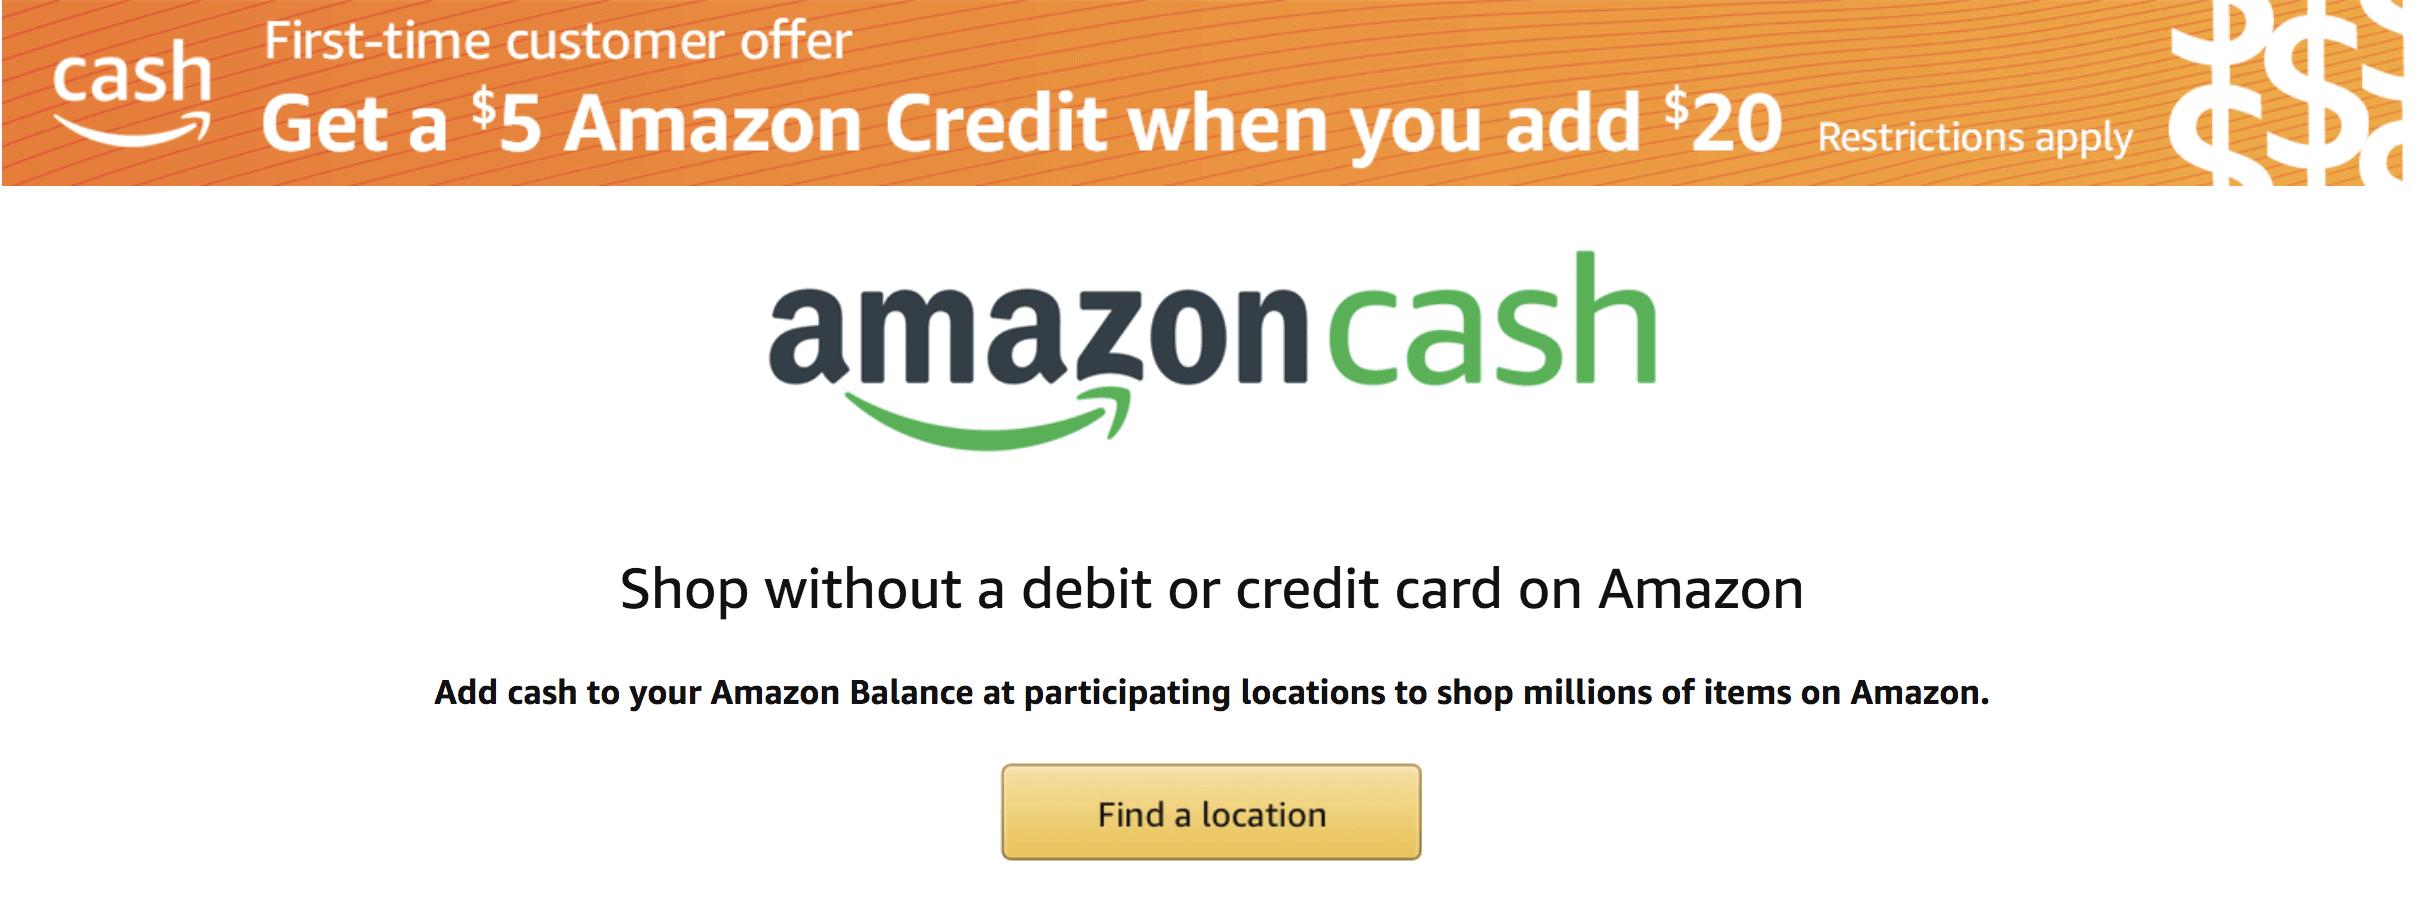 Amazon Prime Hacks - Amazon Cash